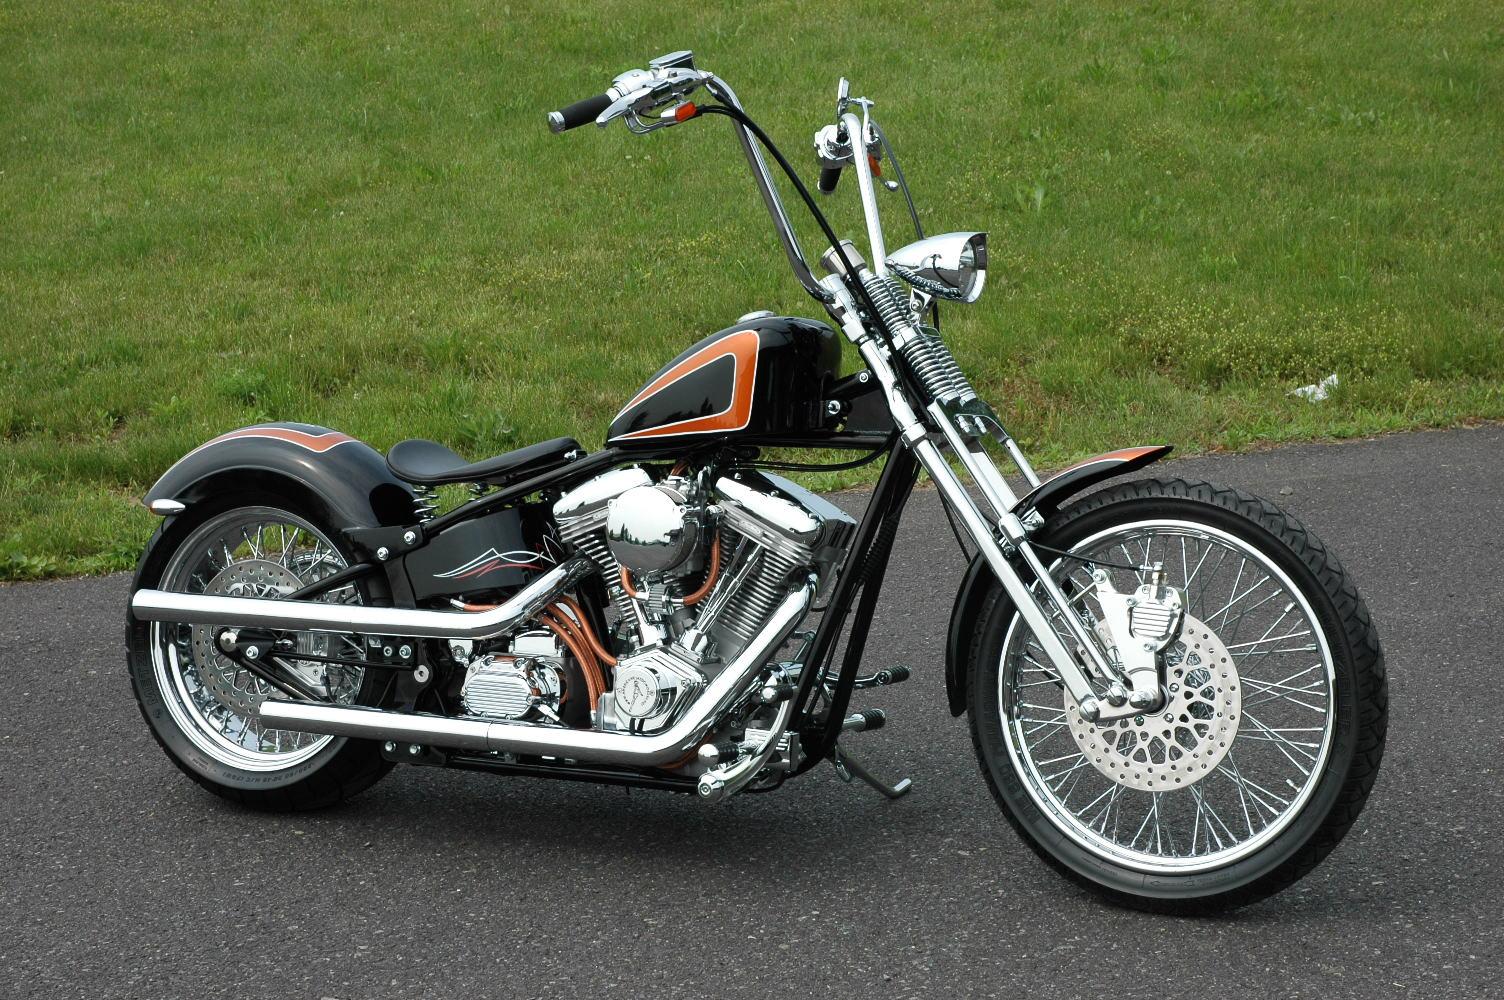 Harley Softail Fenders : Dna strutless quot rear fender harley chopper softail ebay